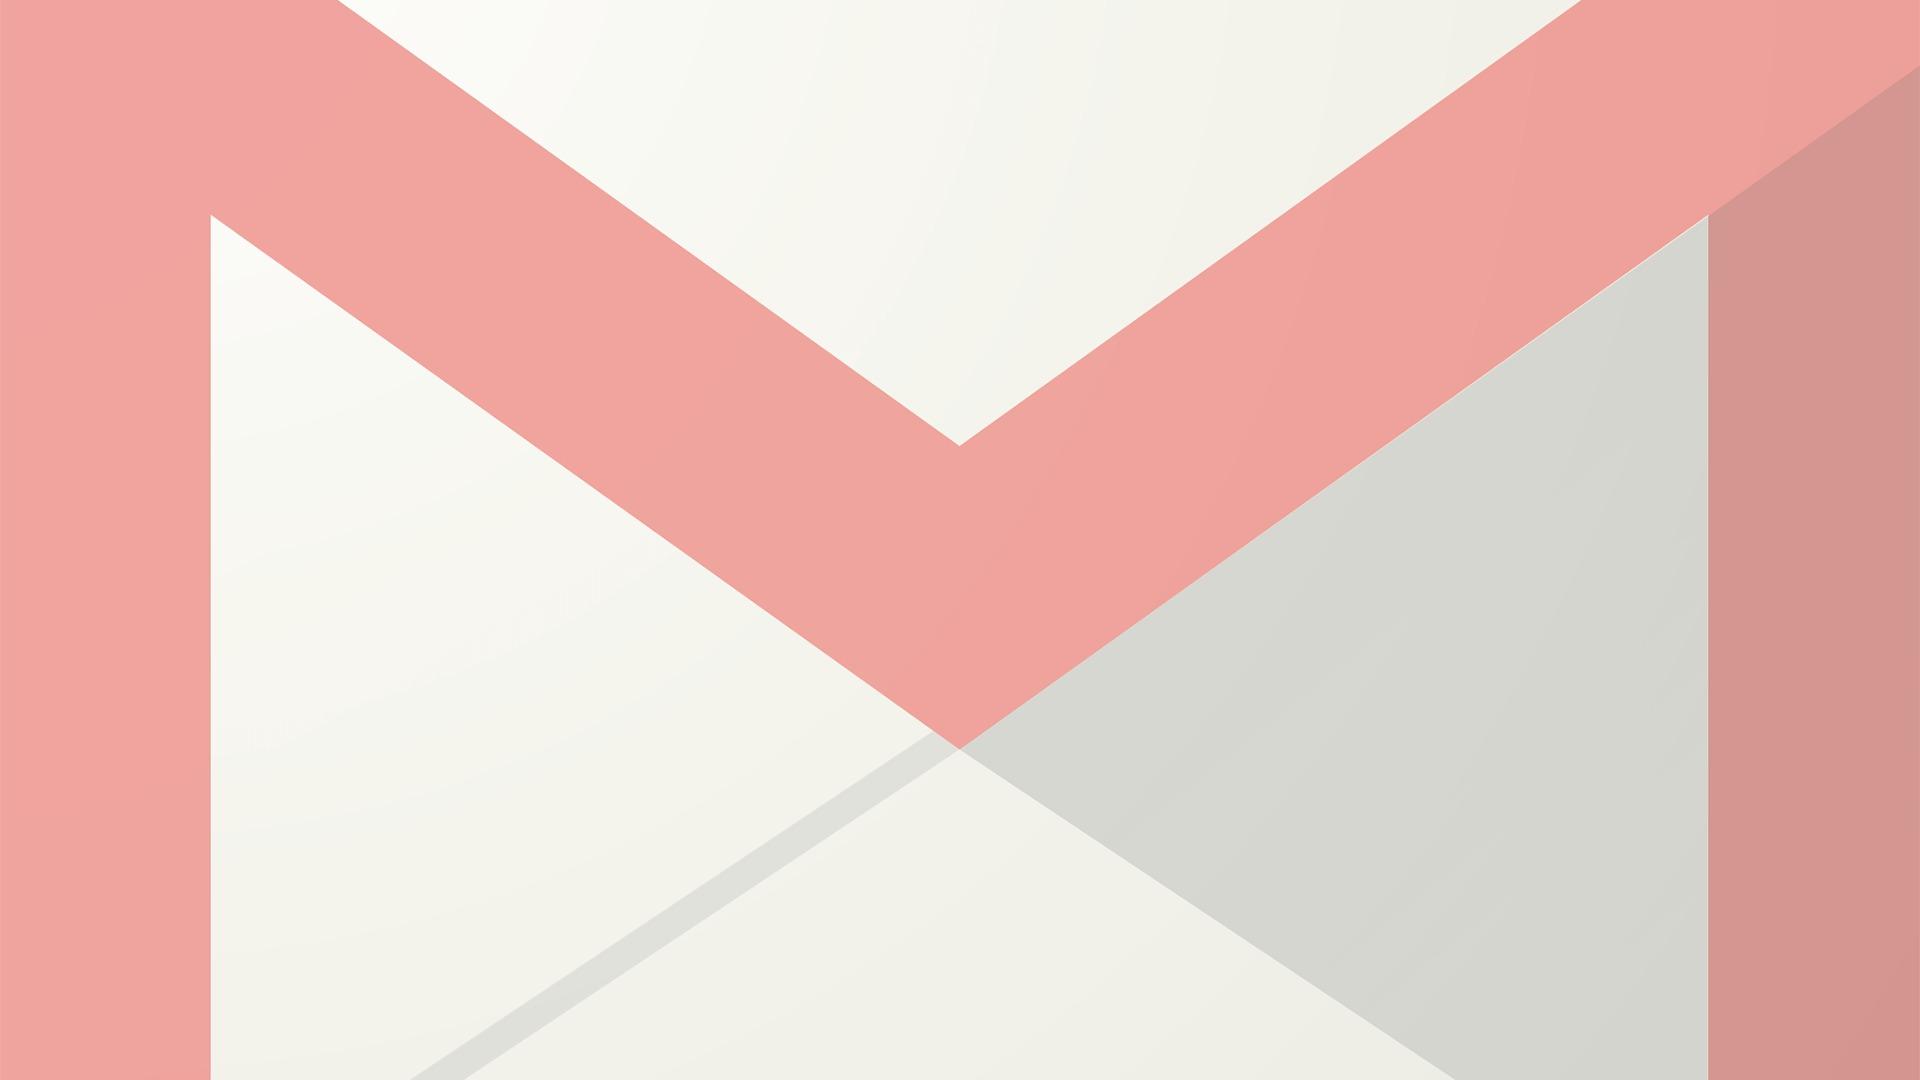 gmail cevrimdisi modu